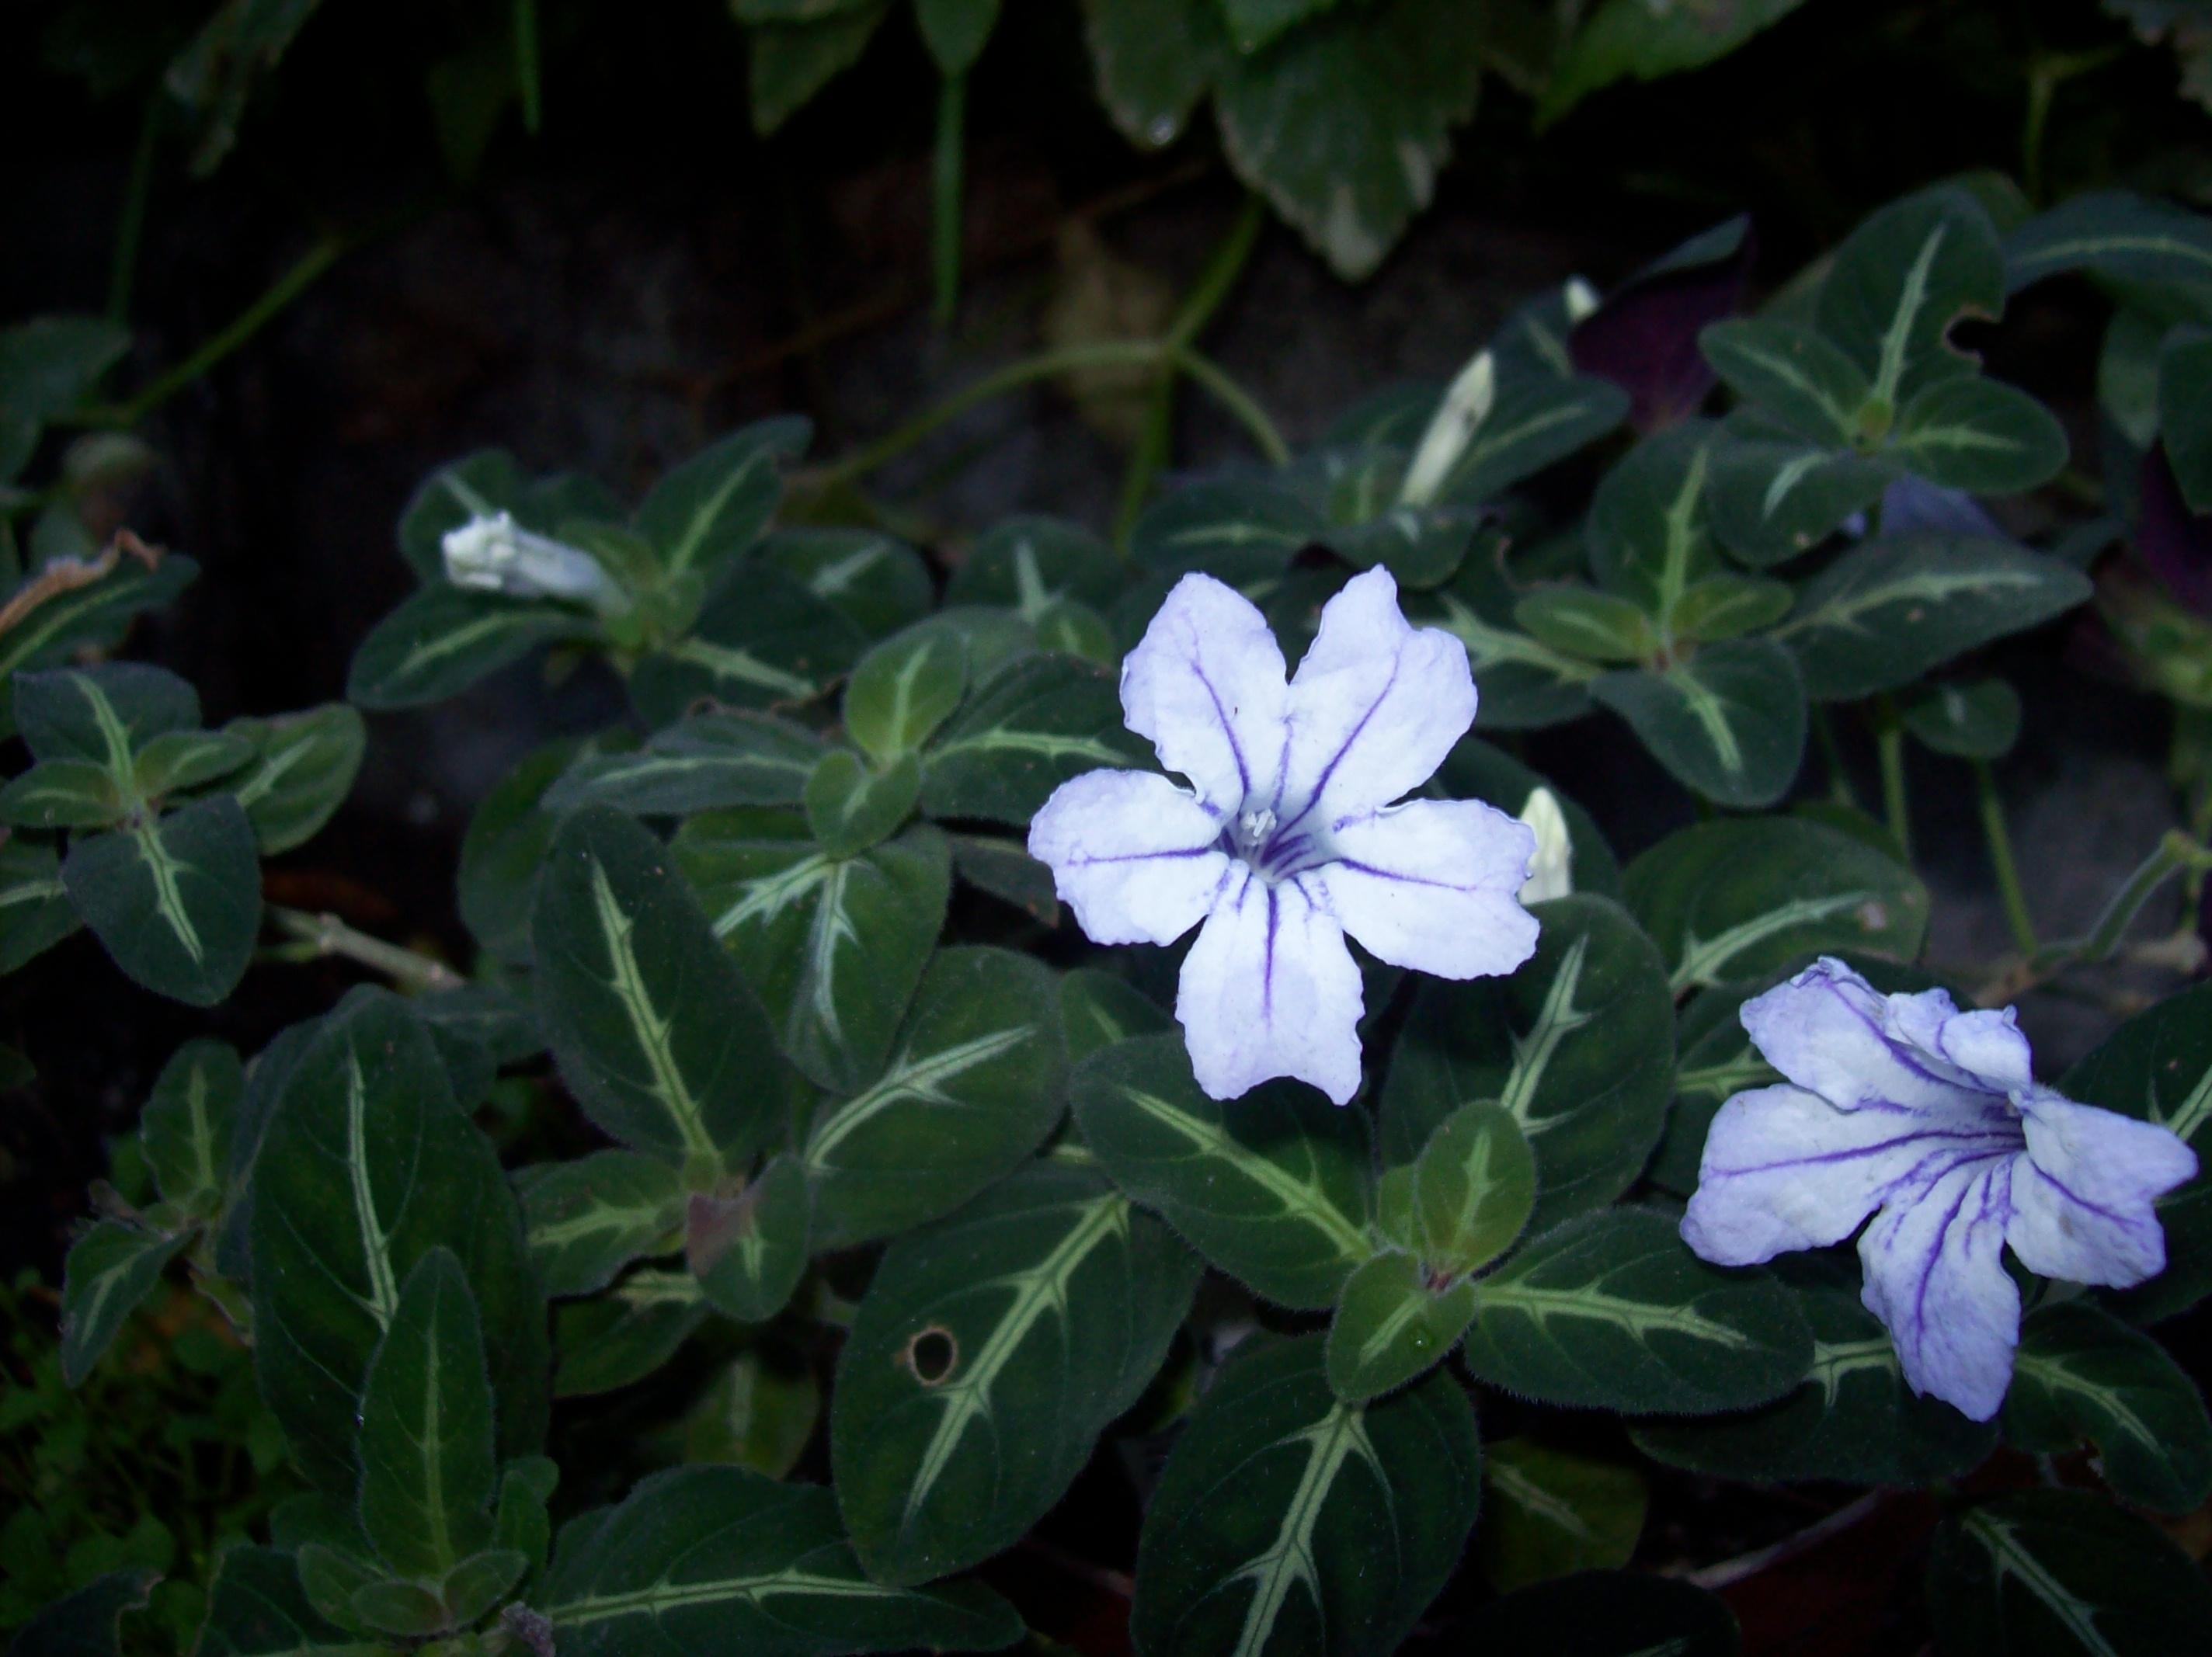 Quelques photos de plantes en fleurs en ce moment 629445ruelliamakoyanableuJPG